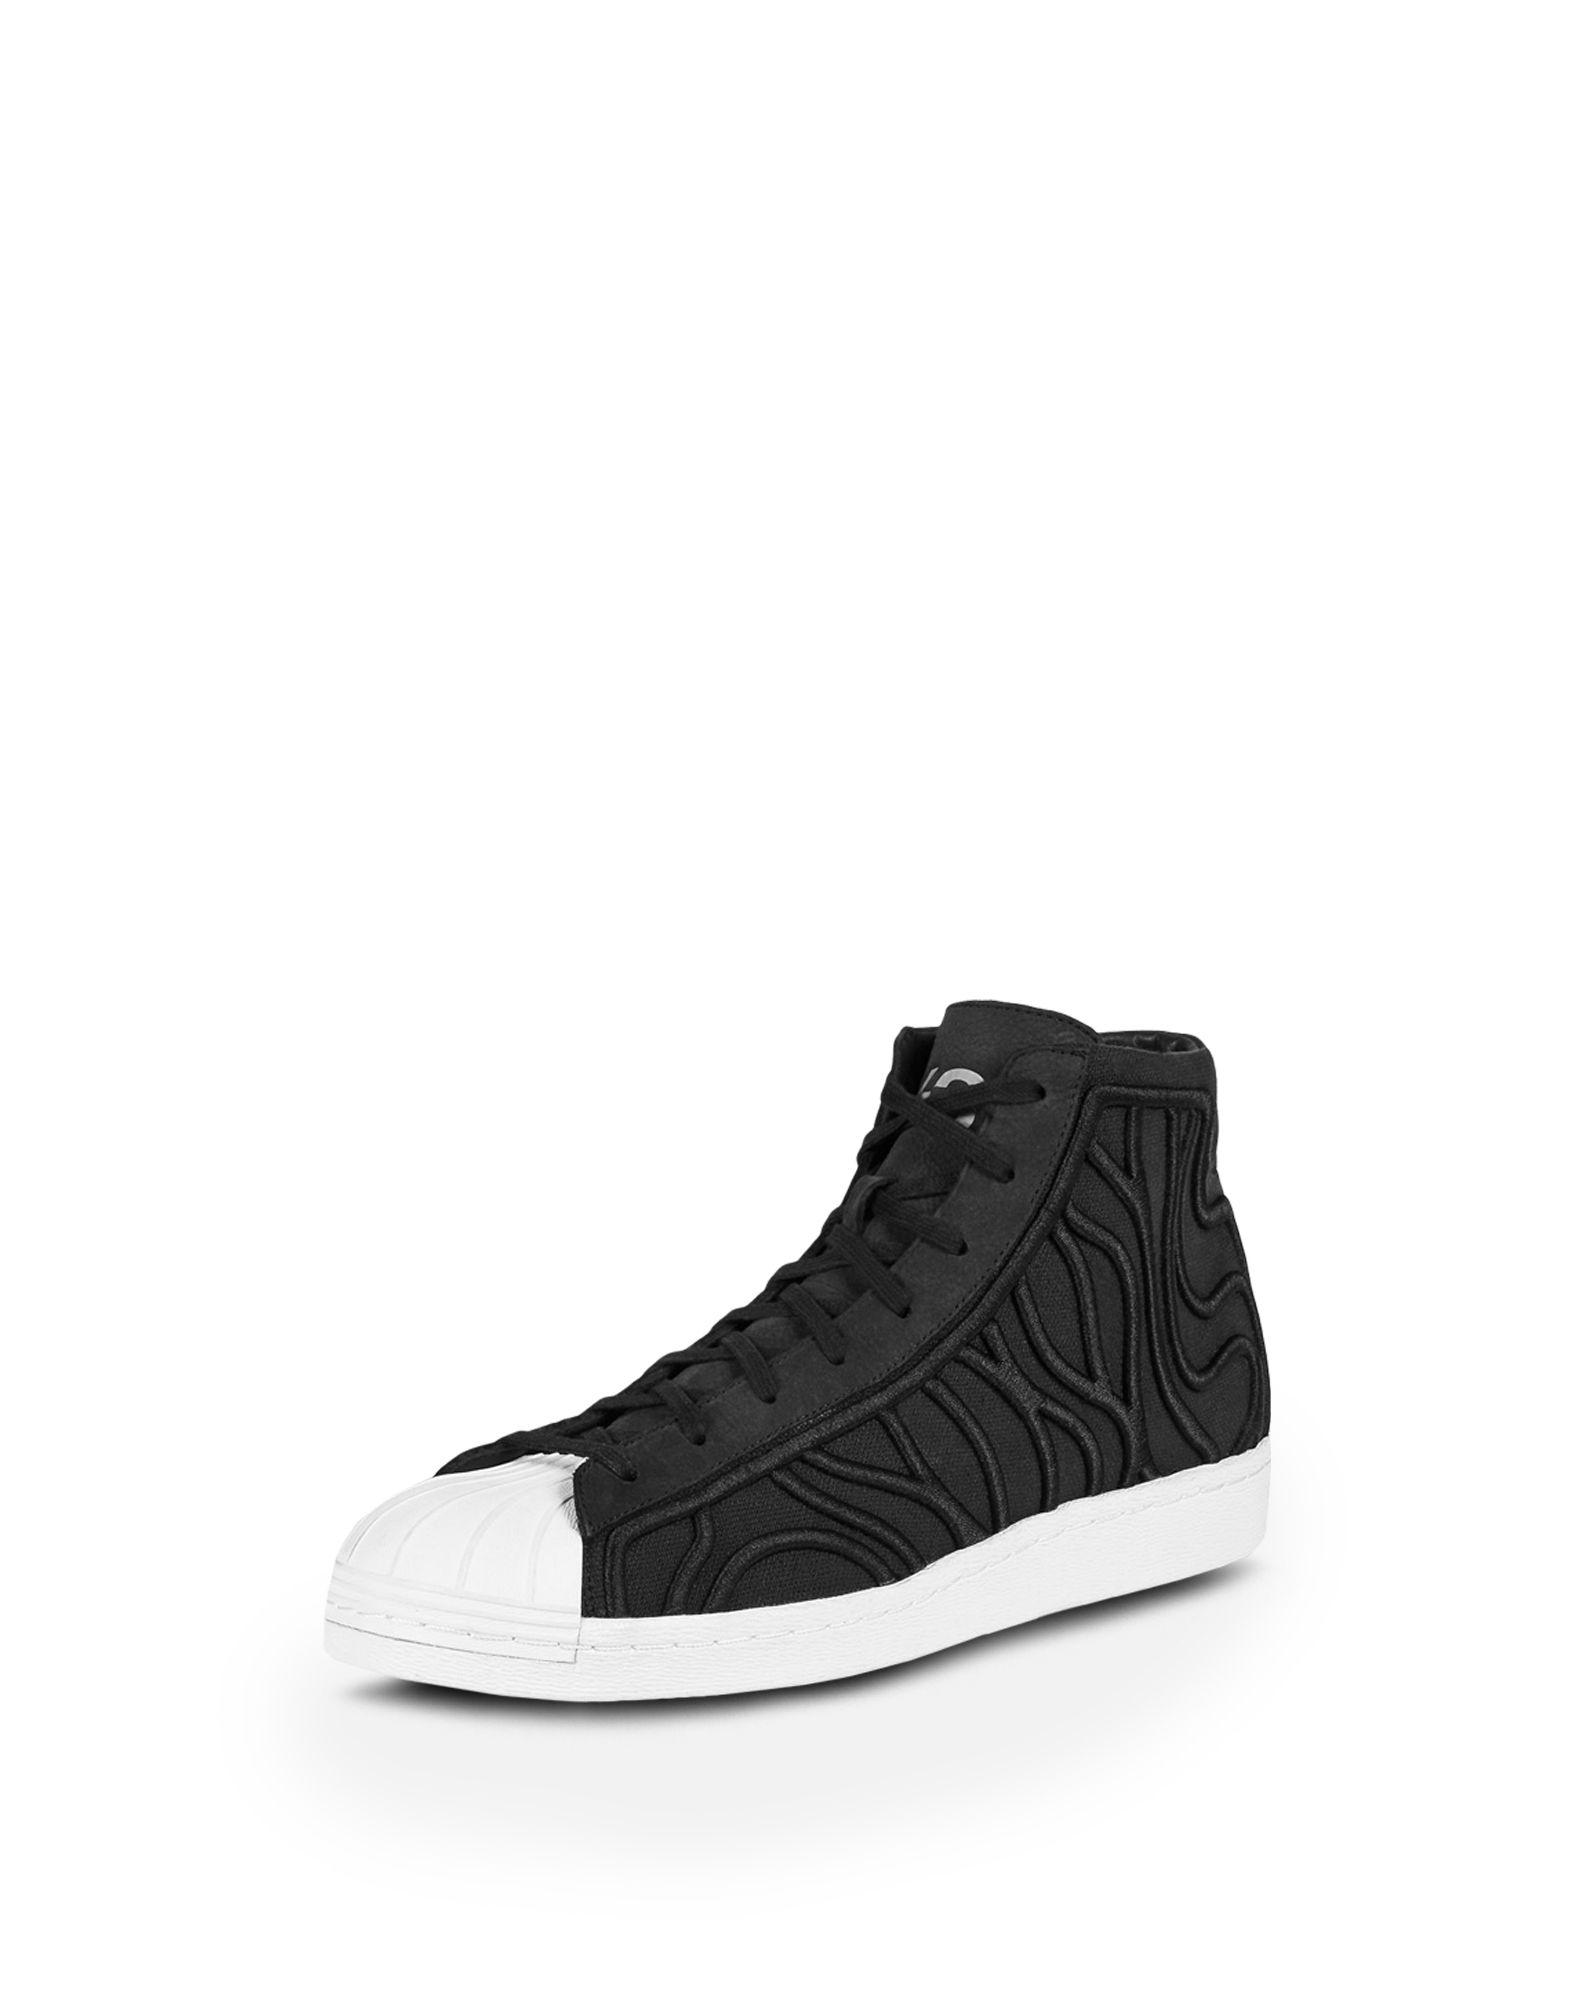 Y-3 Y-3 SHISHU SUPER High-top sneakers E r